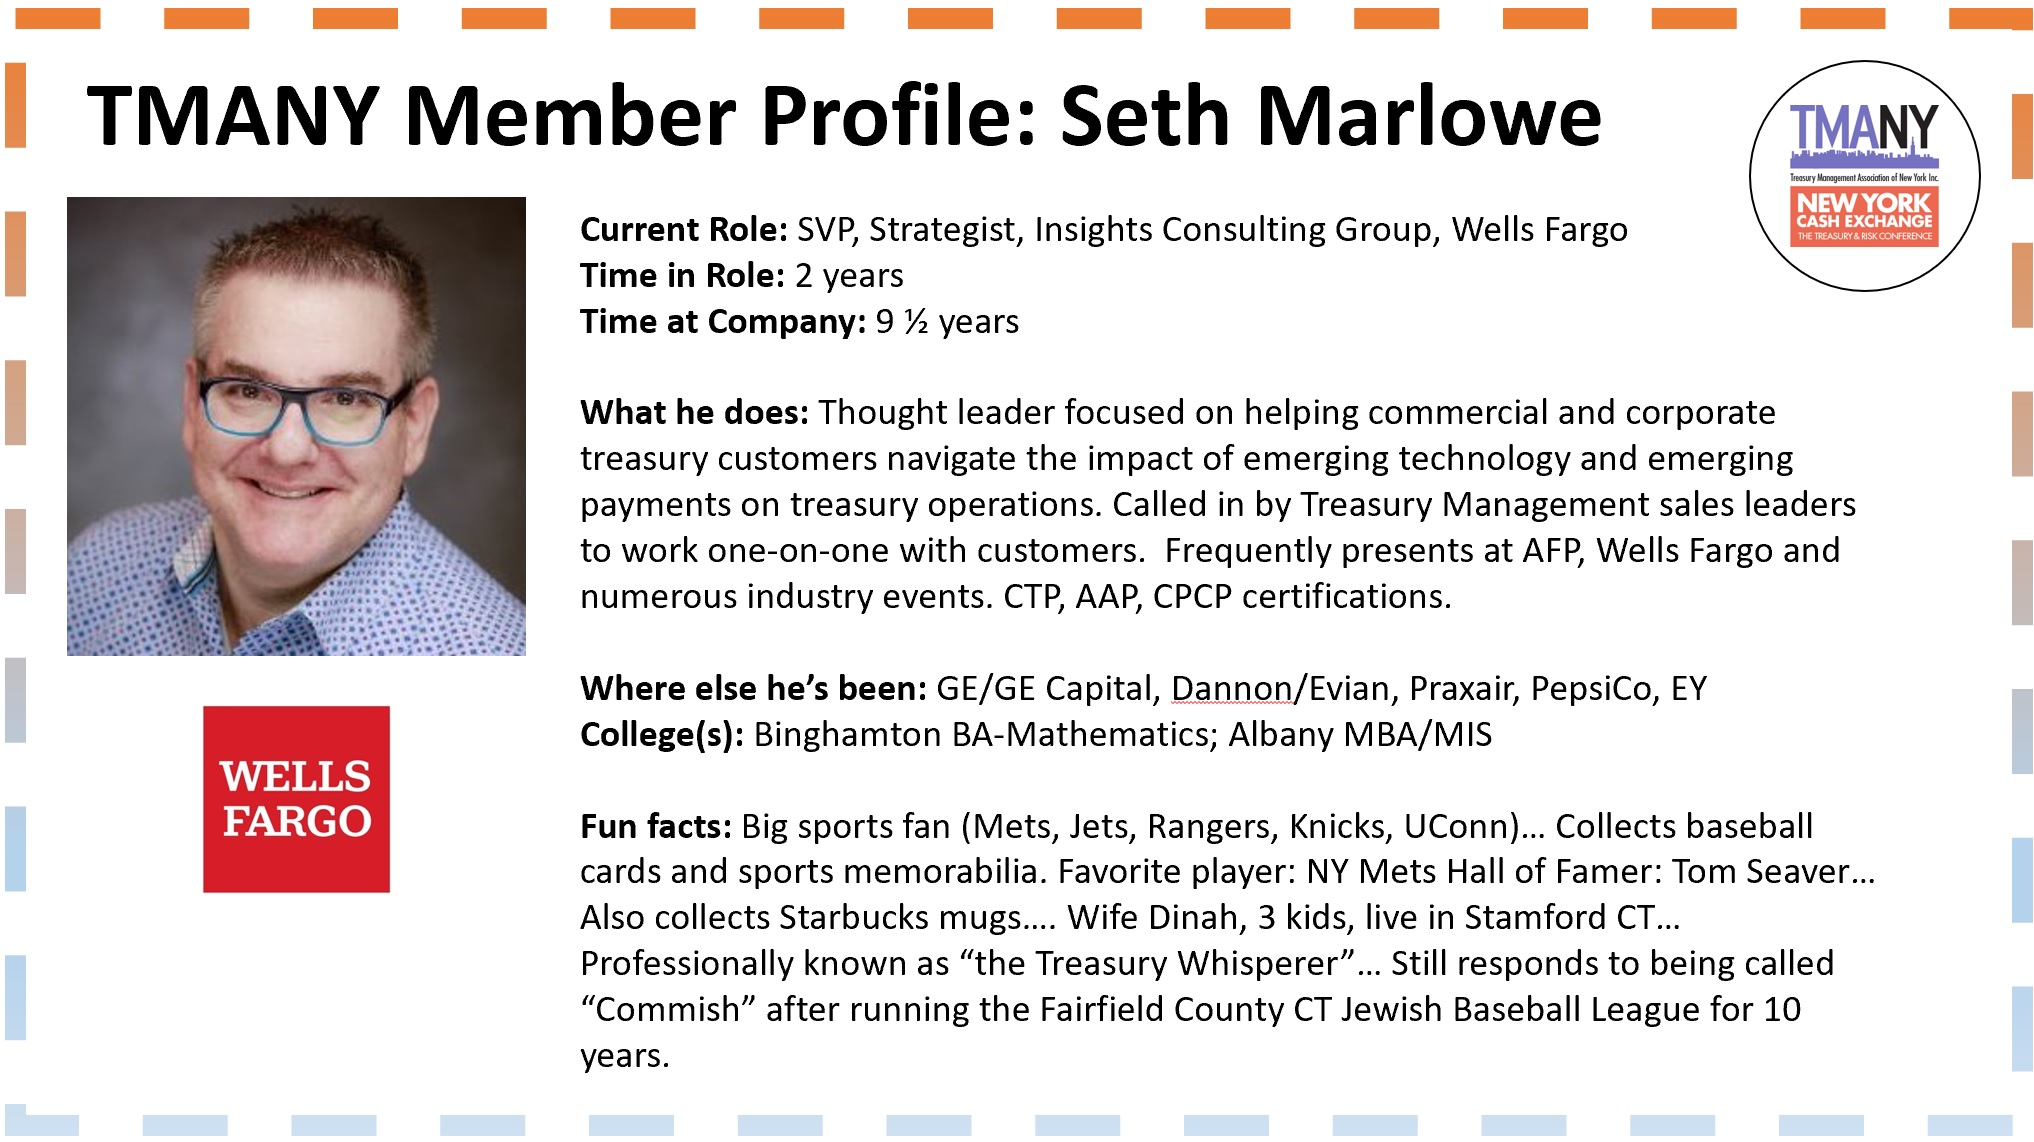 TMANY-Profile-Seth-Marlowe